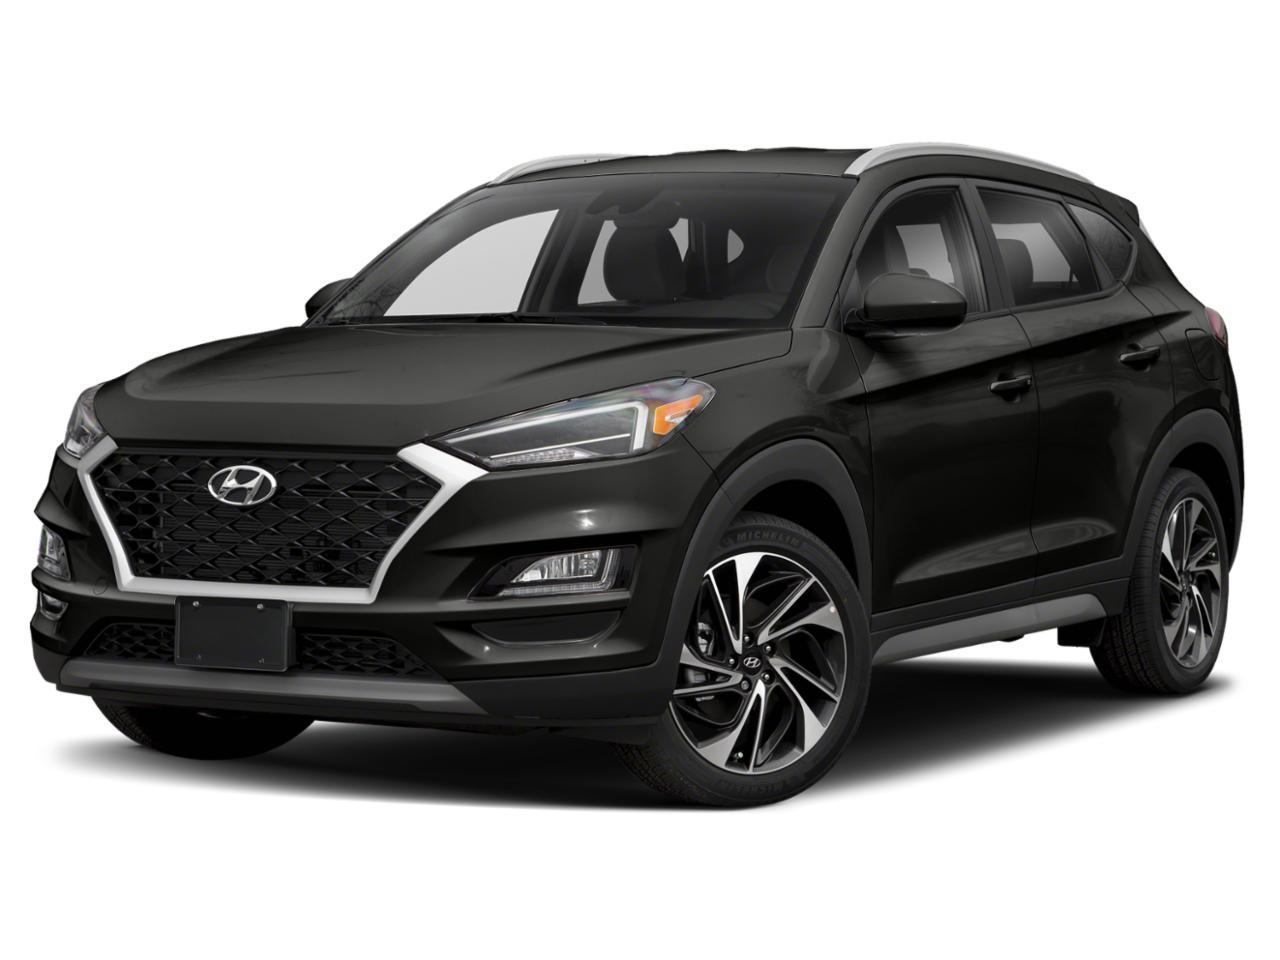 2020 Hyundai Tucson Vehicle Photo in Merrillville, IN 46410